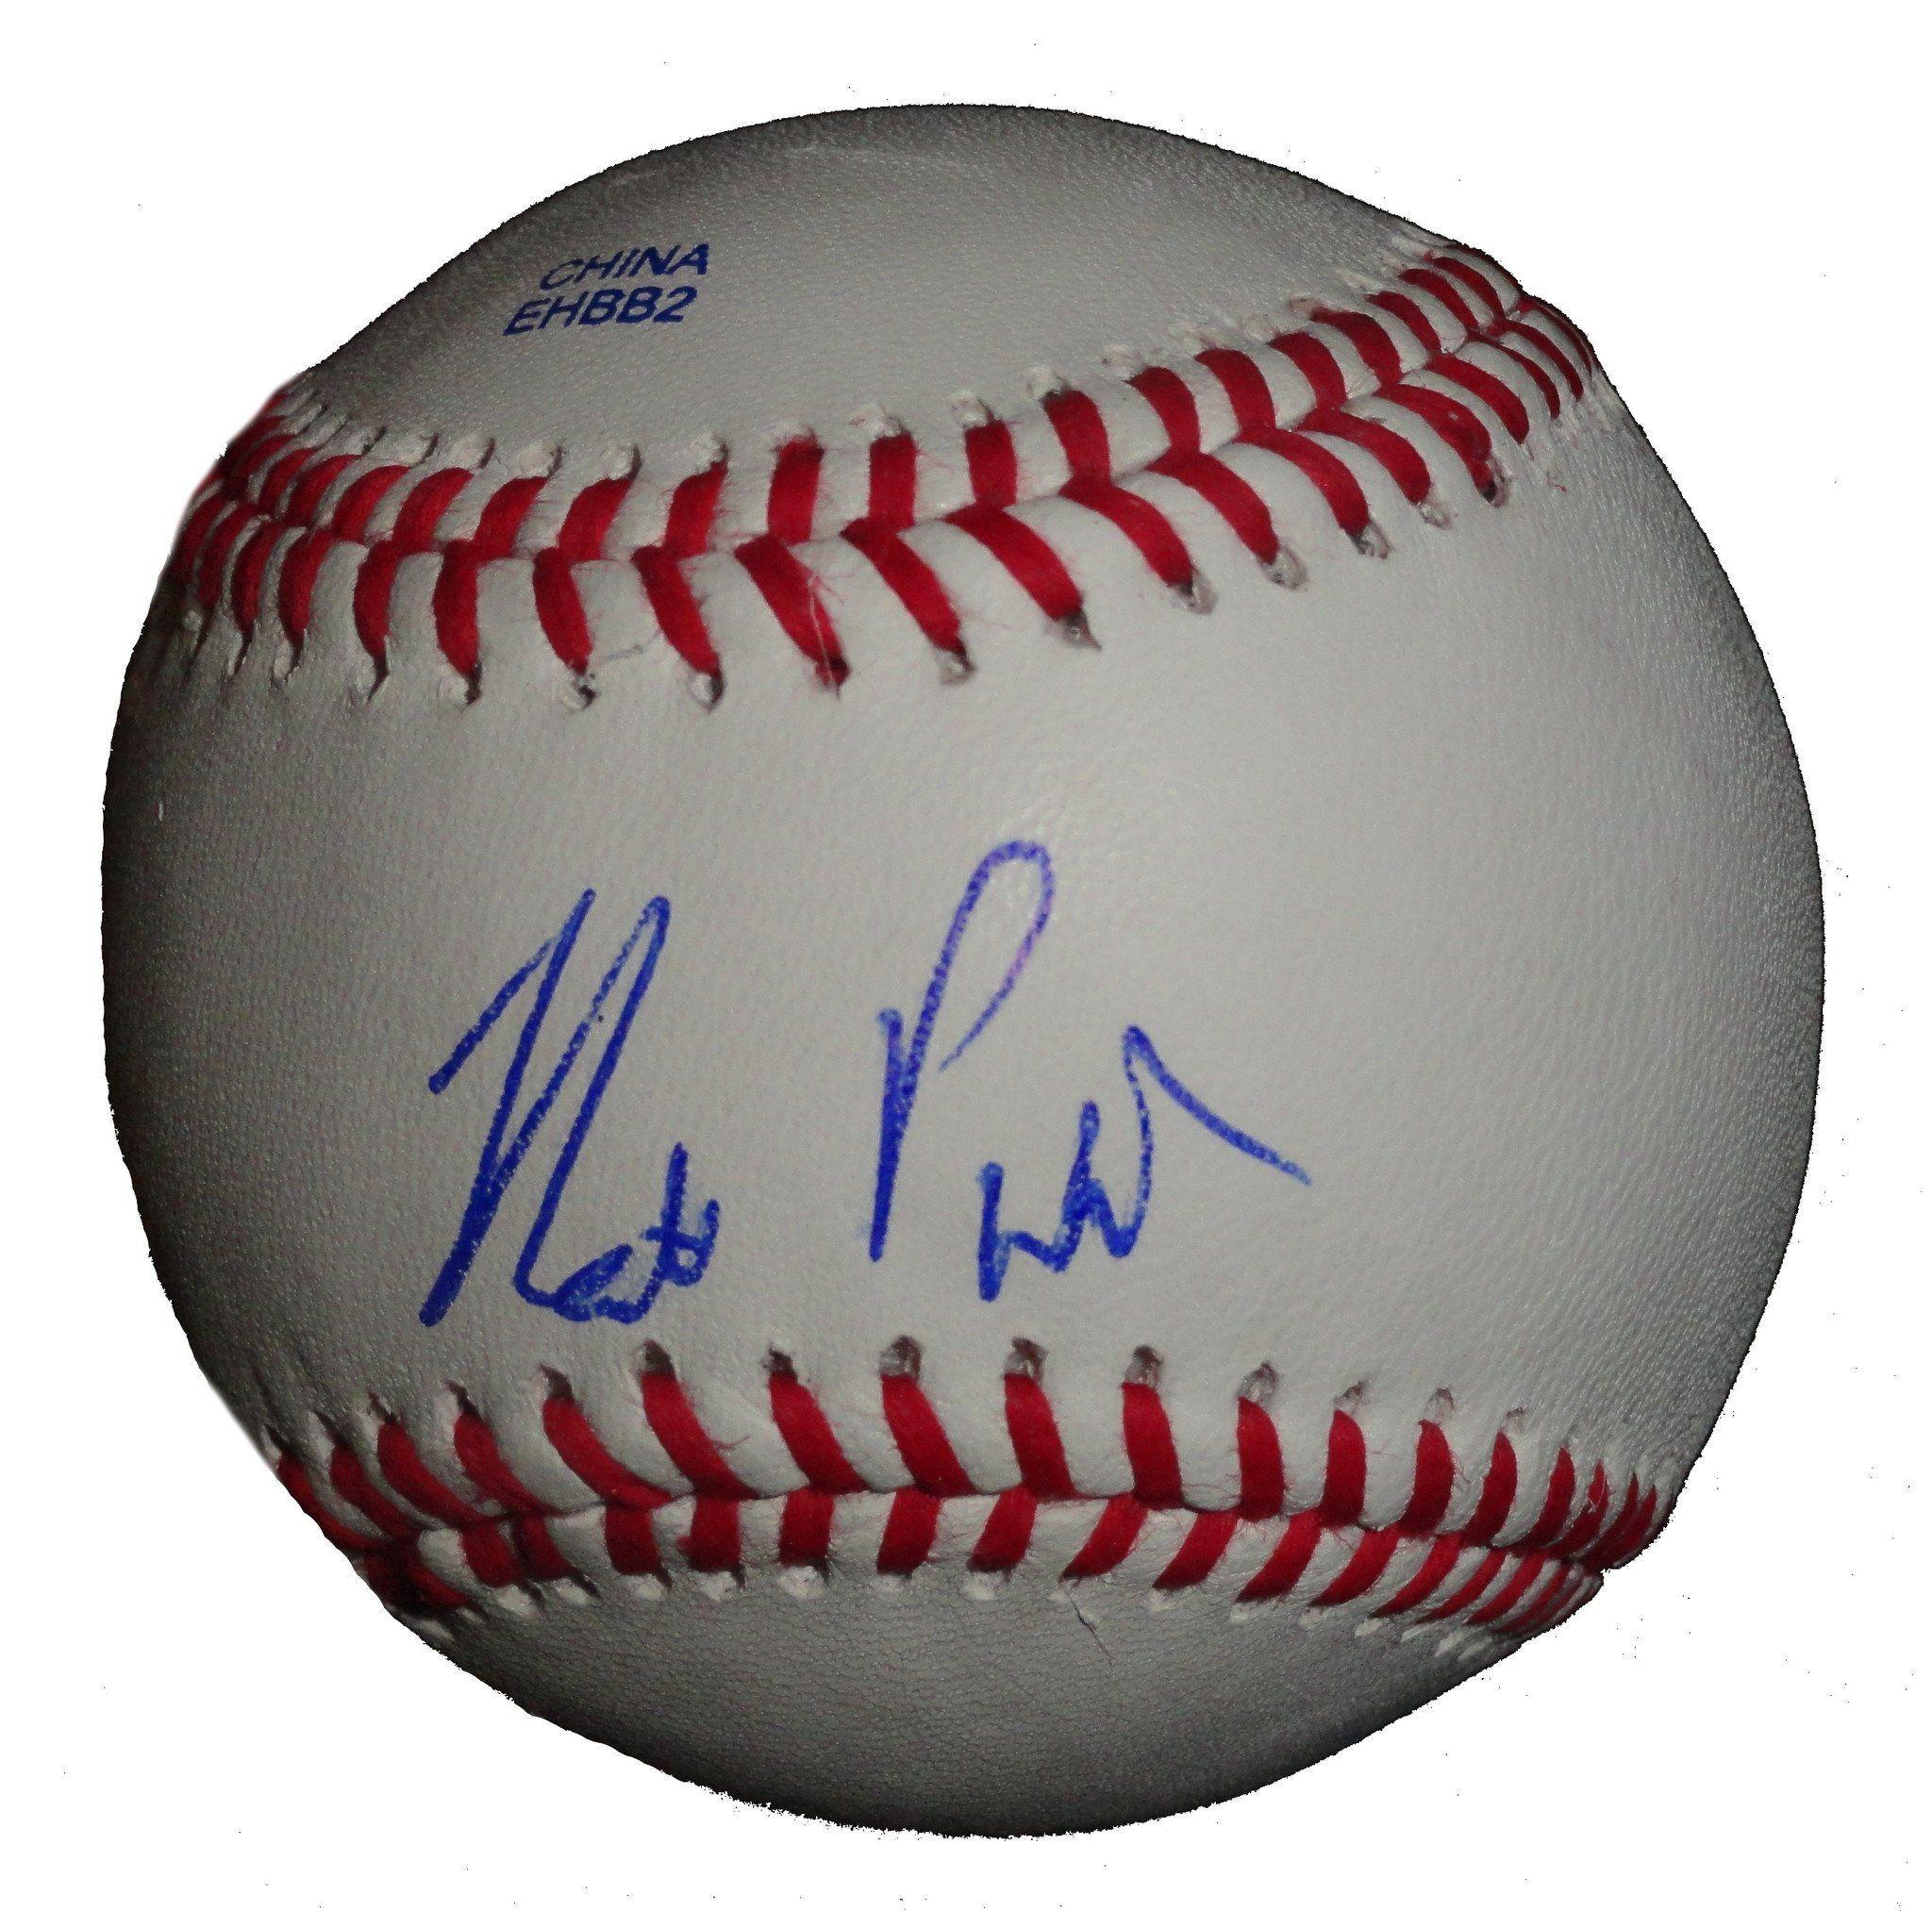 Matt Purke Autographed Rawlings Rolb1 Leather Baseball, Proof Photo